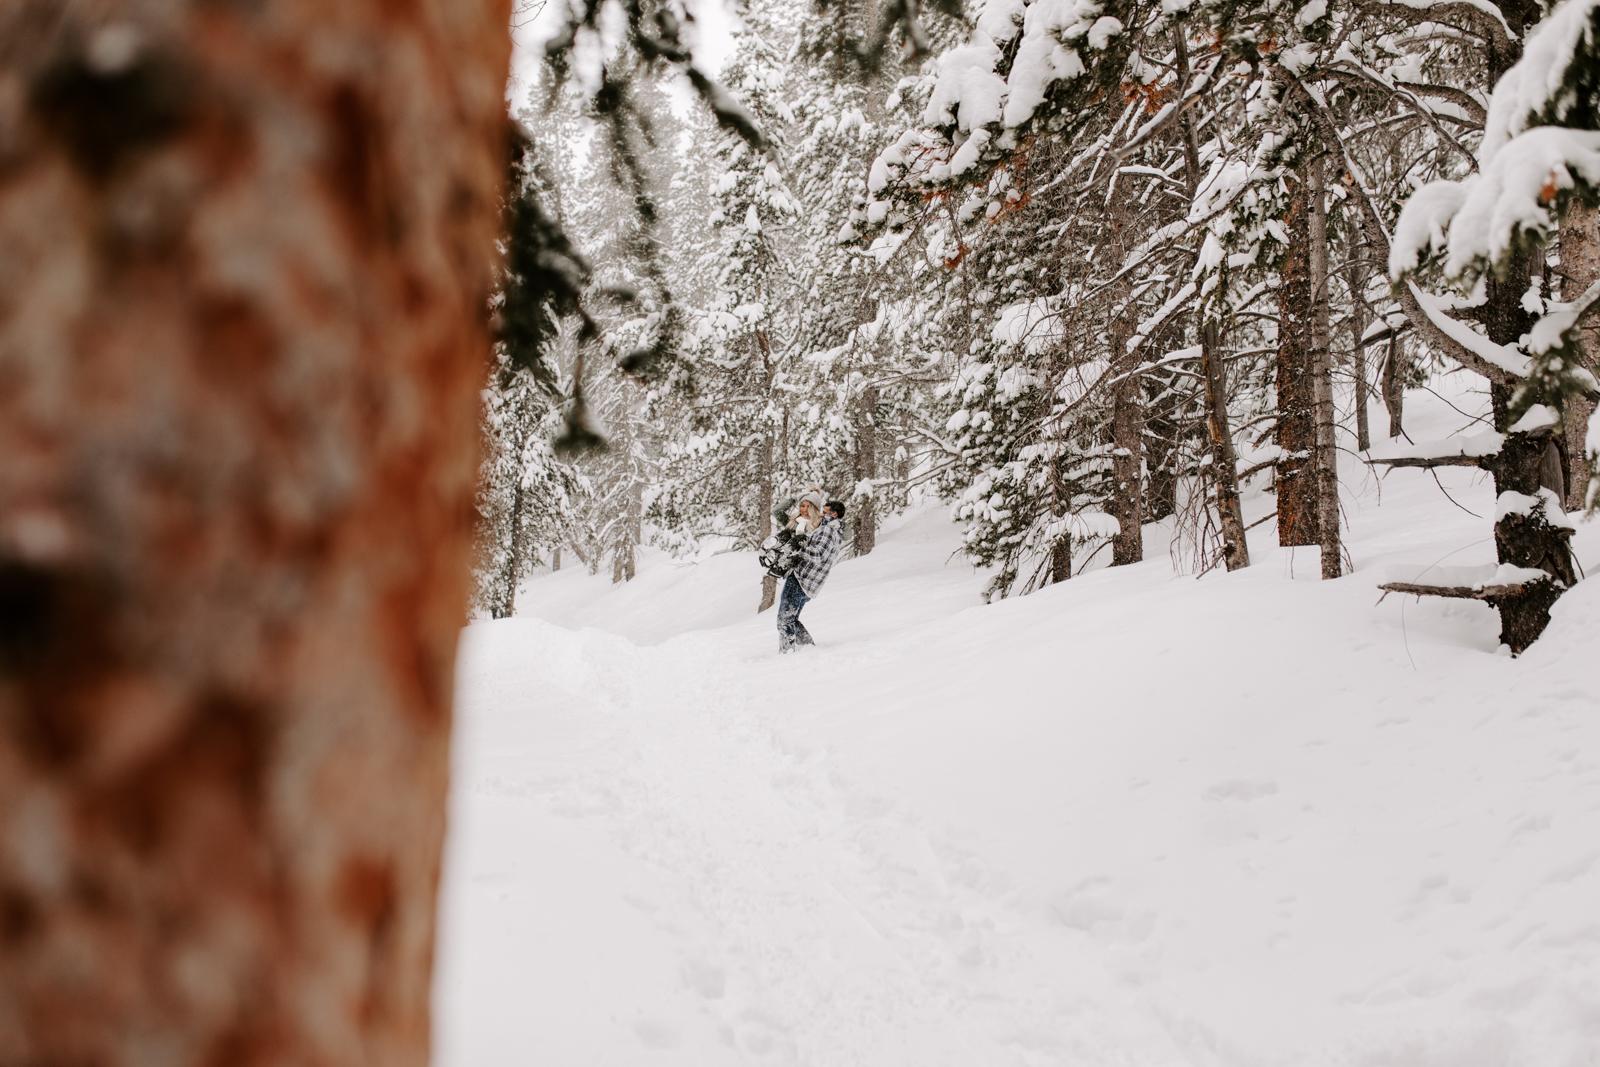 Vanessa & Danny Snow Rocky Mountain National Park Engagement Elopement Photography Photographer-45.jpg